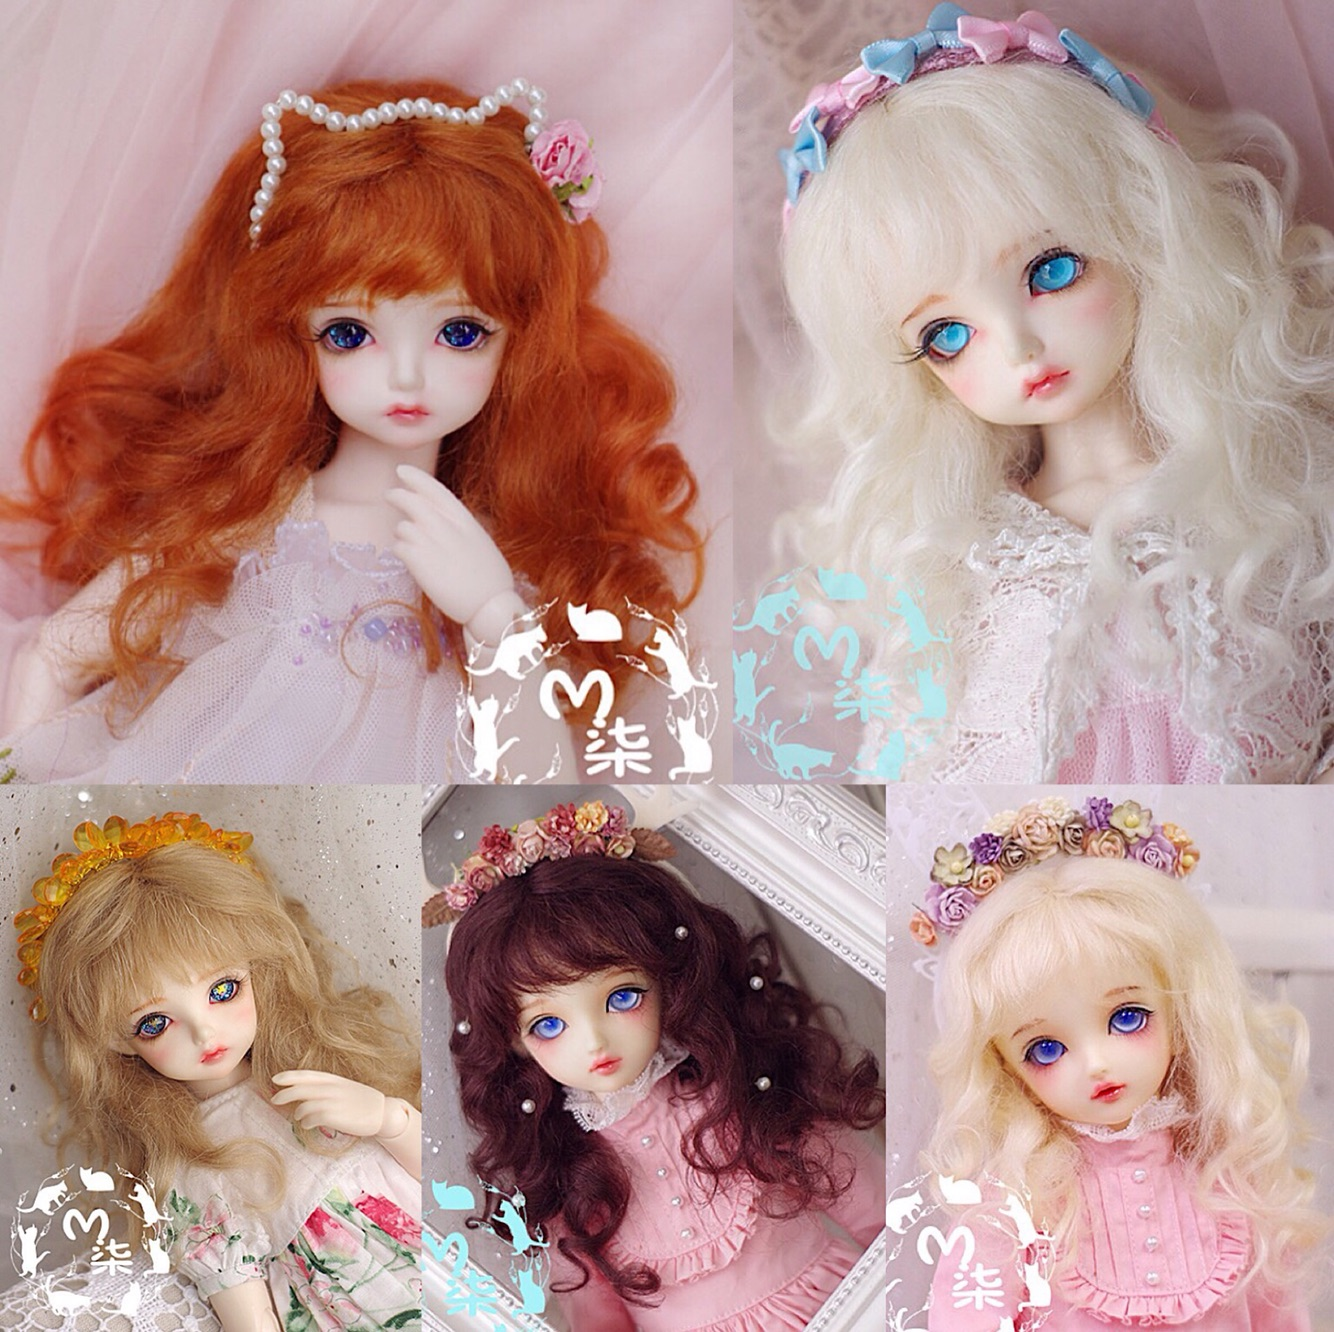 M7-bjd Doll Wig Mohair 8-9inch 7-8inch 6-7inch 5-6inch 4-5inch 3-4inch 1/3 1/4 1/6 1/8 1/12 Blond Brown Red